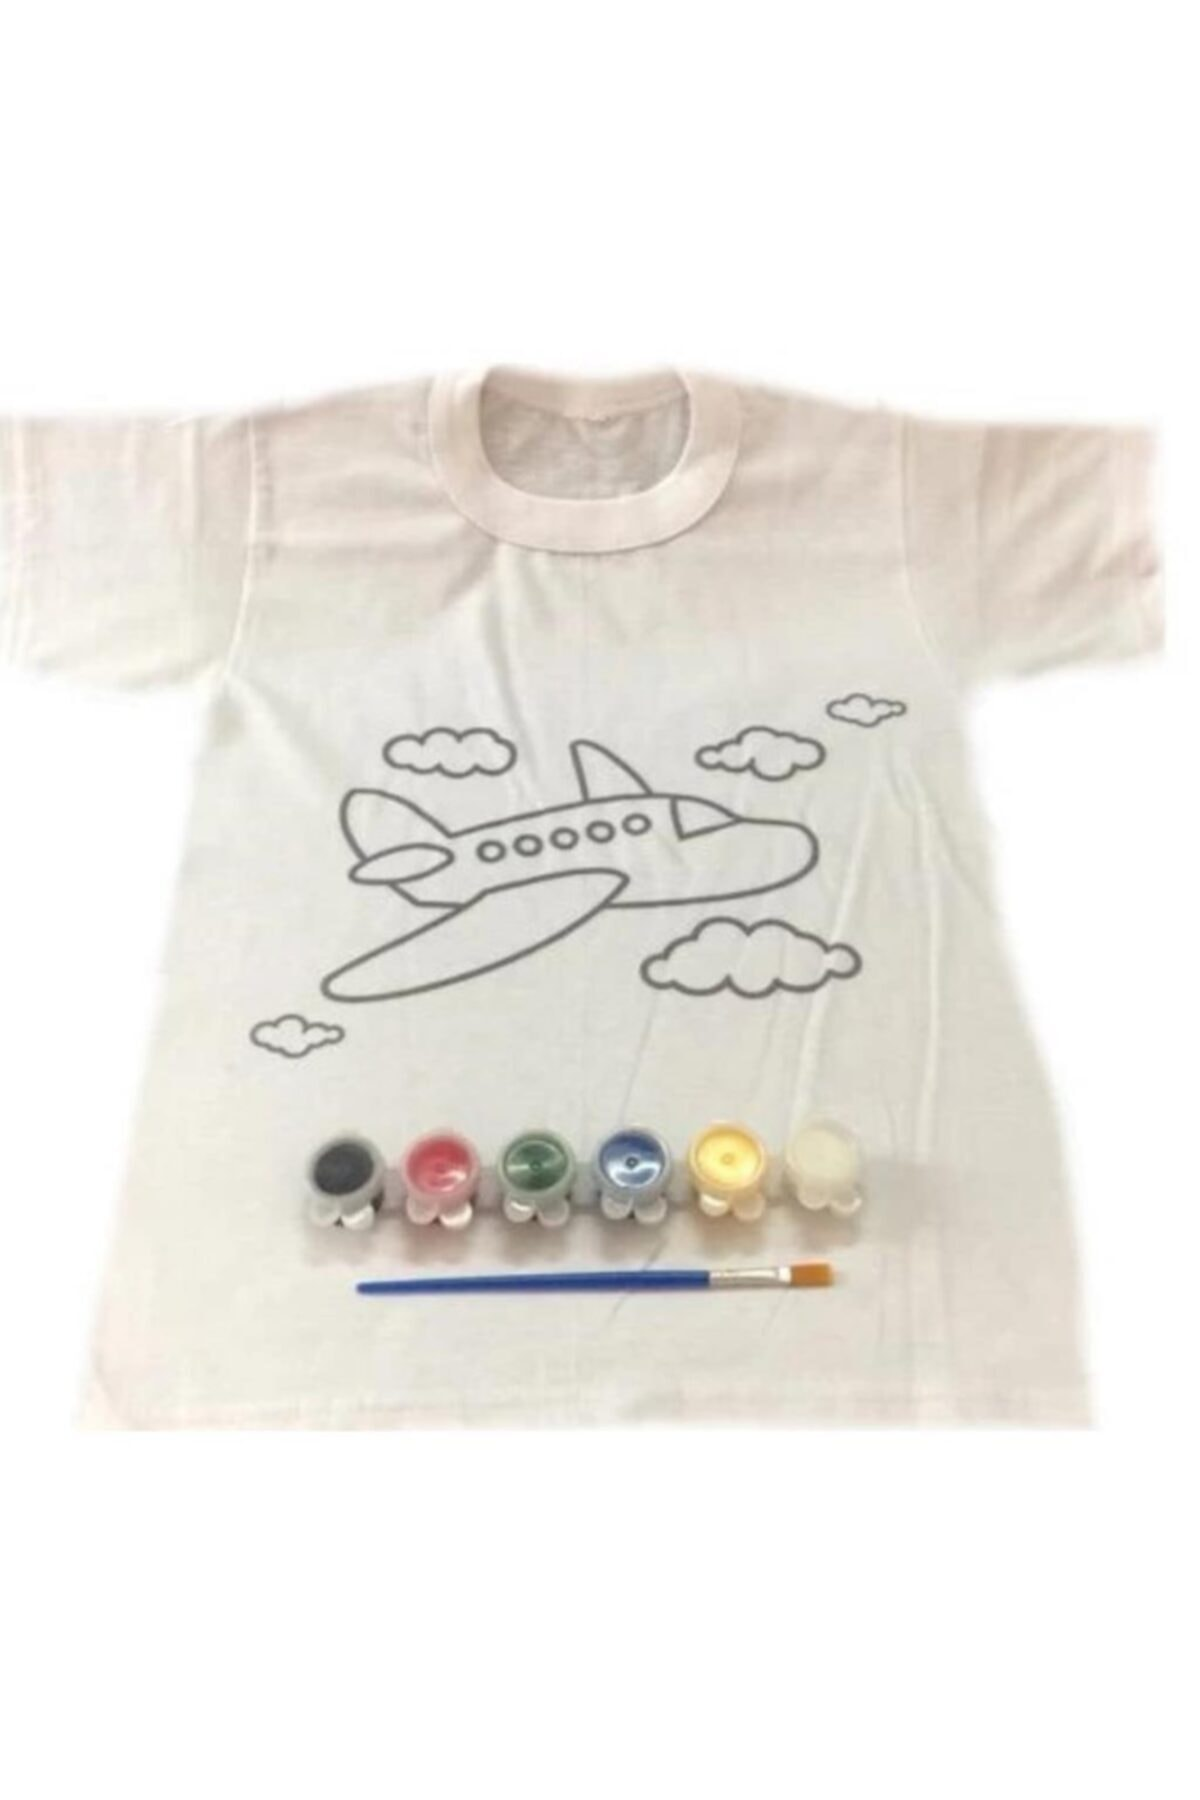 Joy and Toys Uçak Desenli T-shirt Boyama Seti 8-9 Yaş Çocuk Aktivite 1